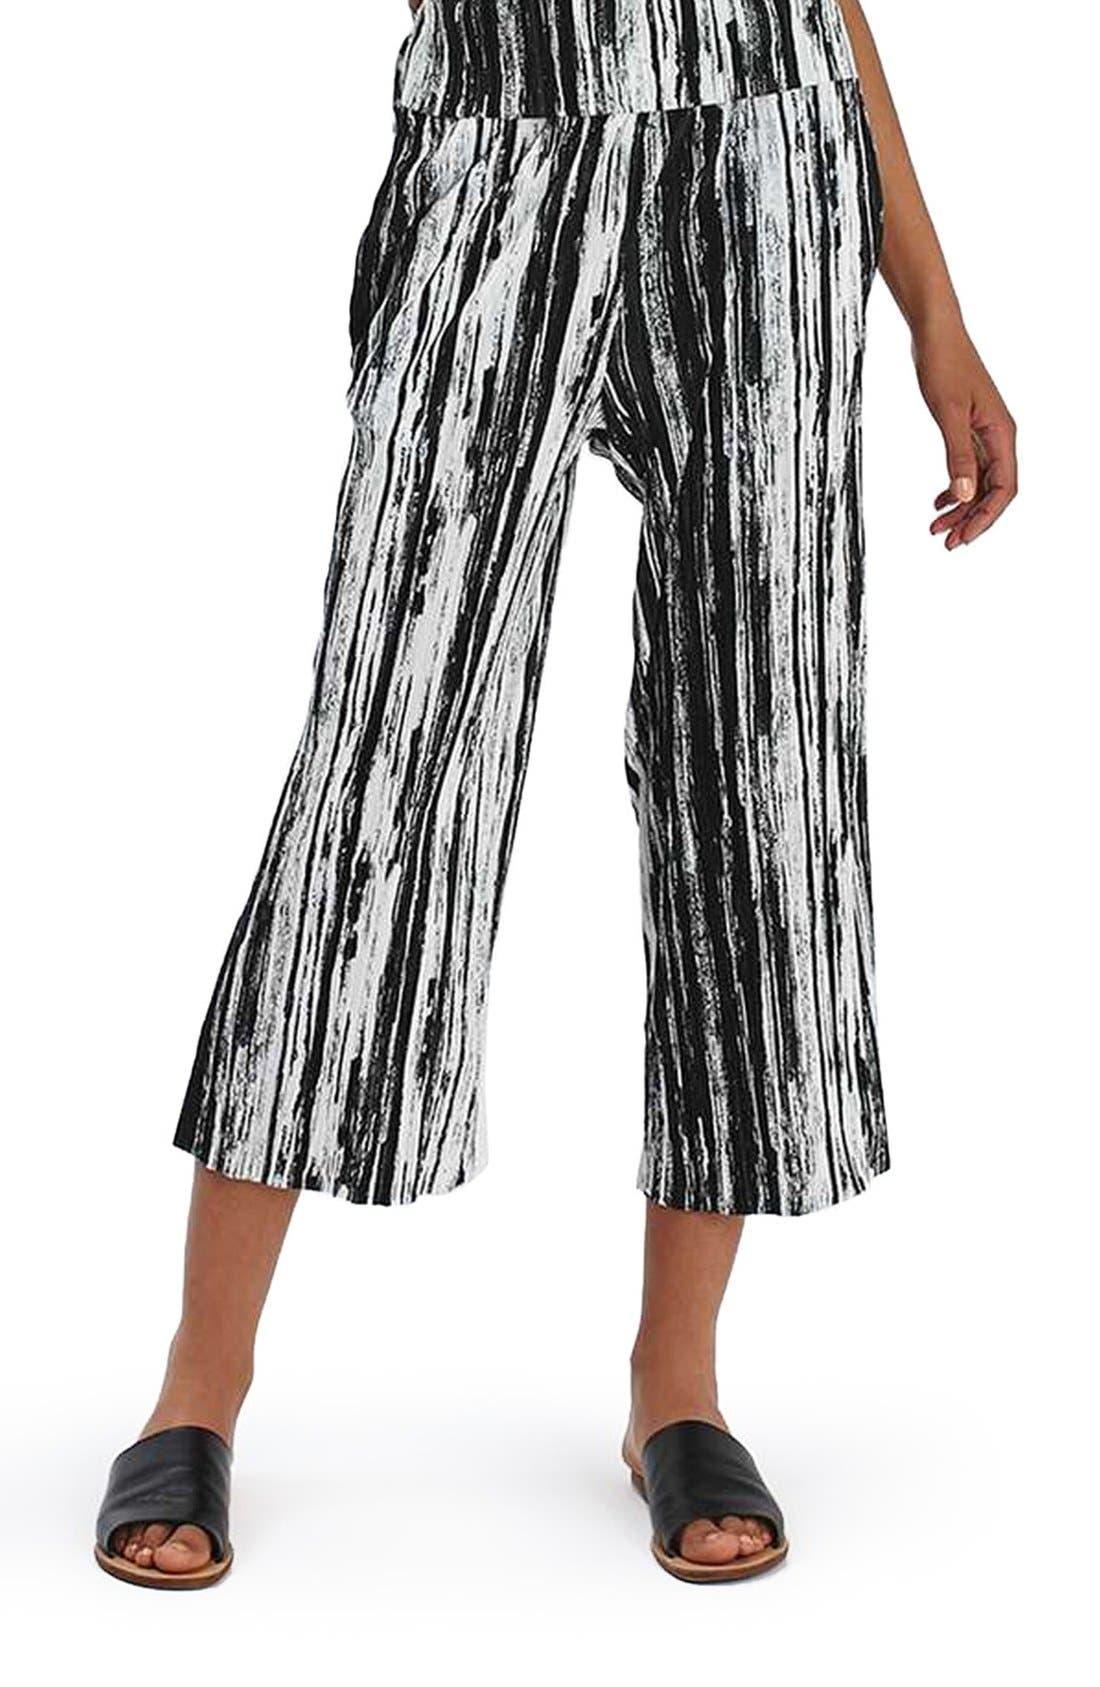 Alternate Image 1 Selected - Topshop Scratch Stripe Plissé Trousers (Petite)